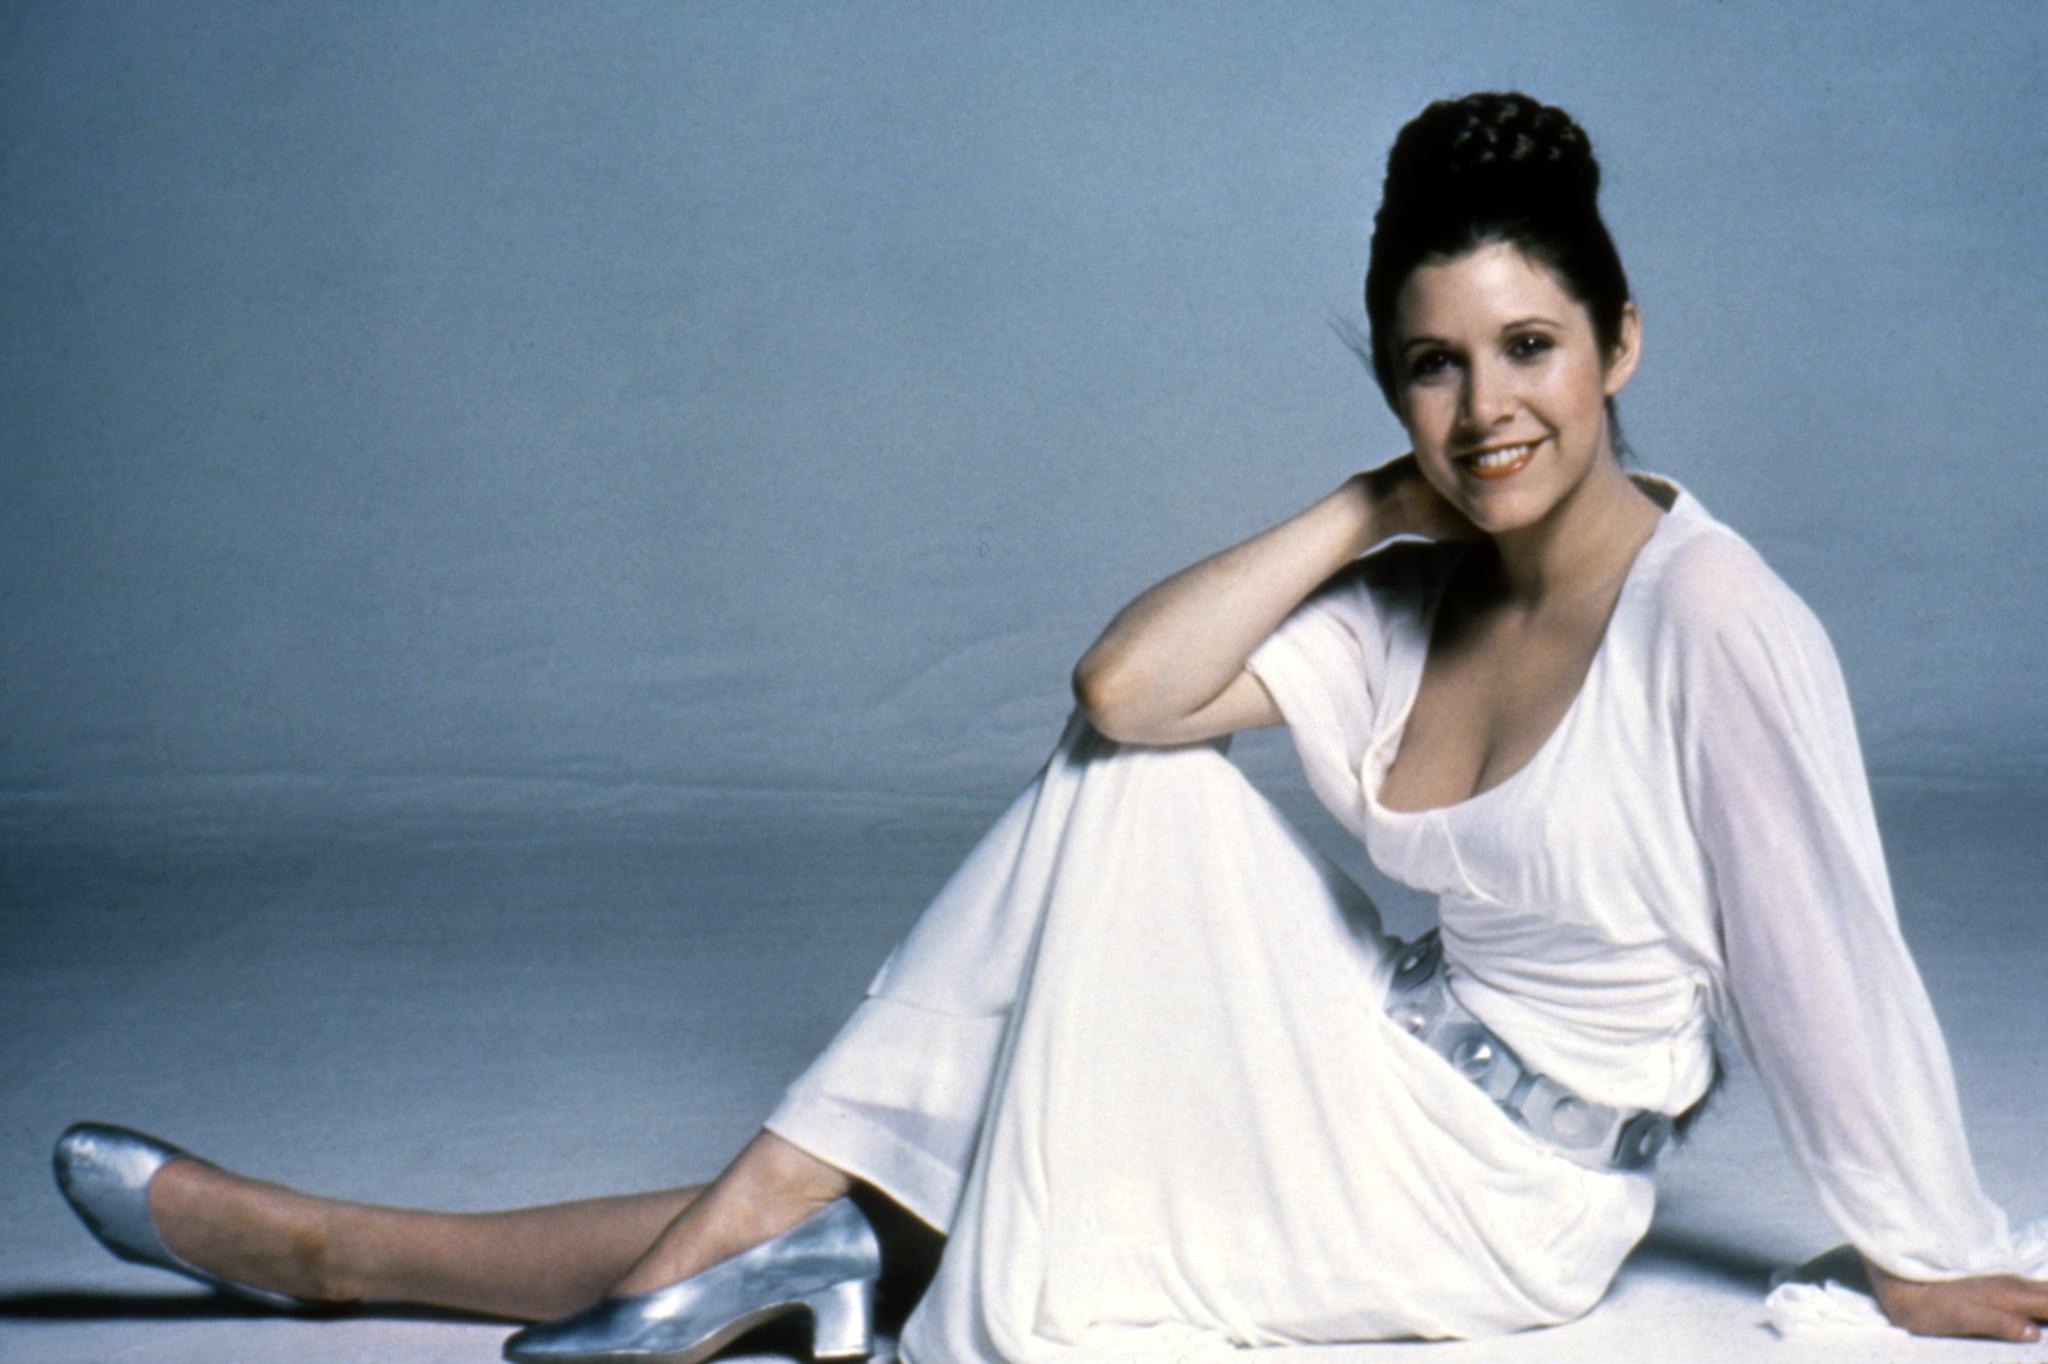 Billie Lourd Princess Leia Hairstyle At Star Wars Premiere